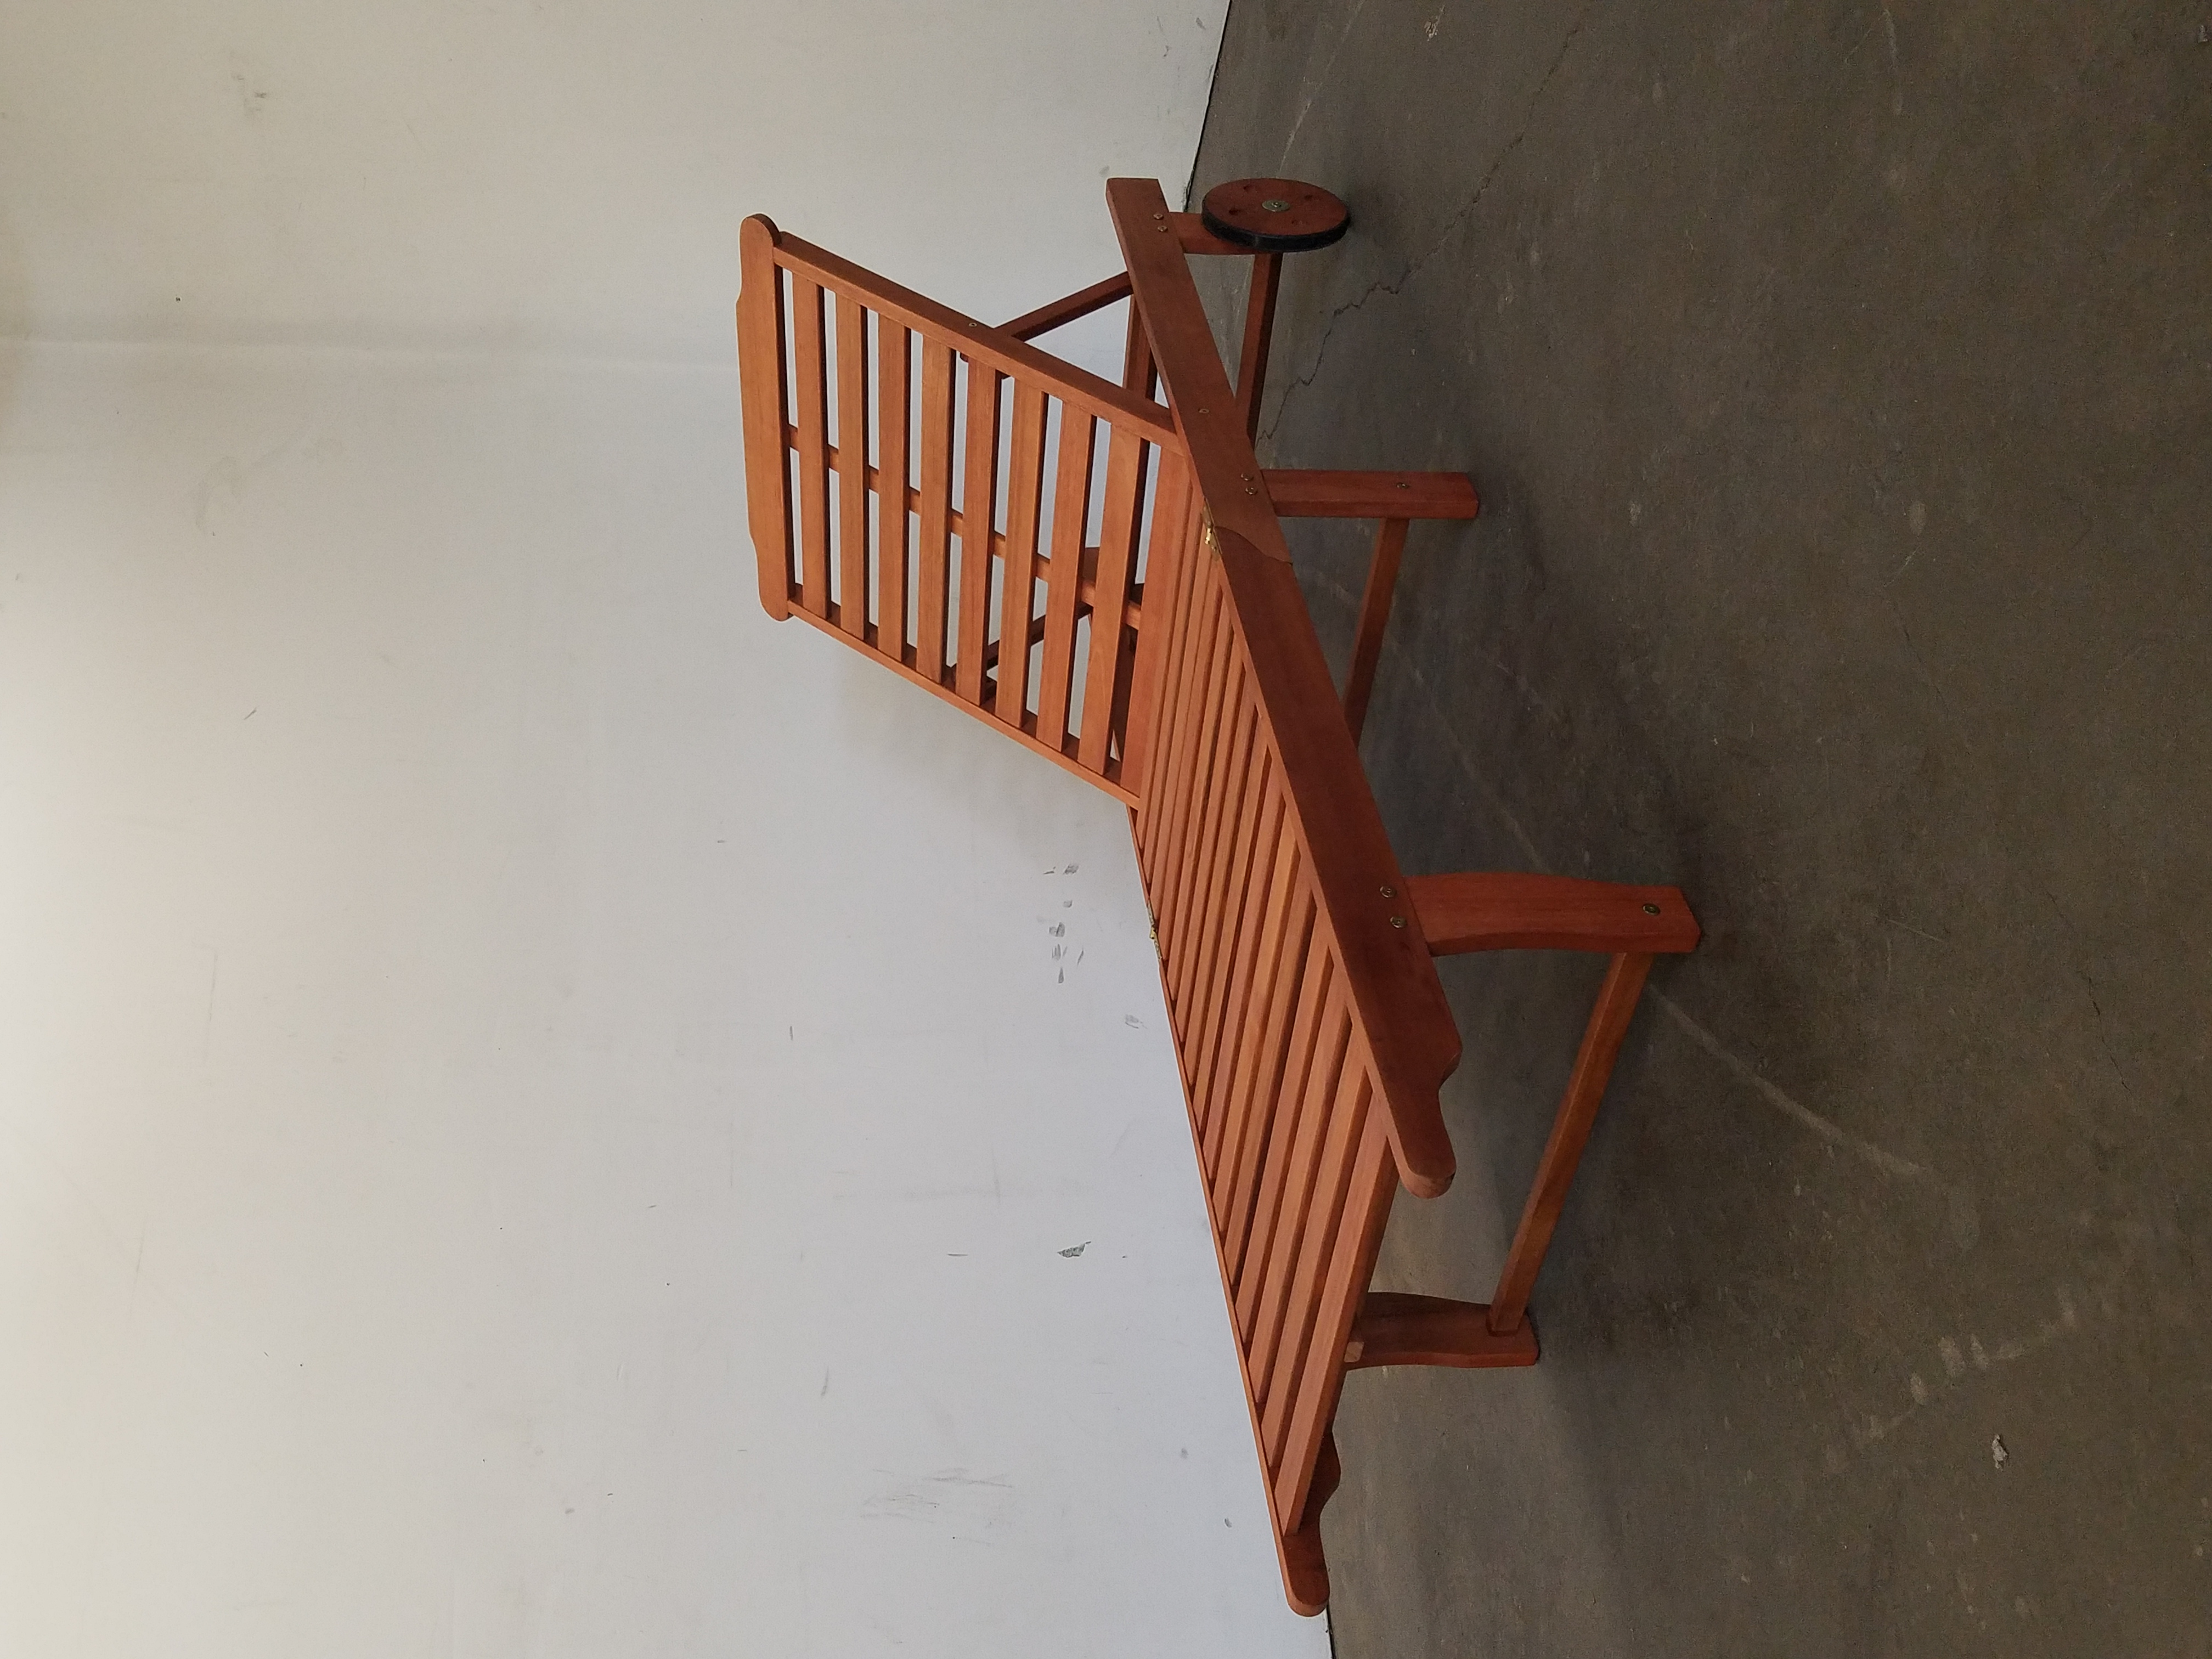 Chaise Lounger, Eucalyptus $ 160.00